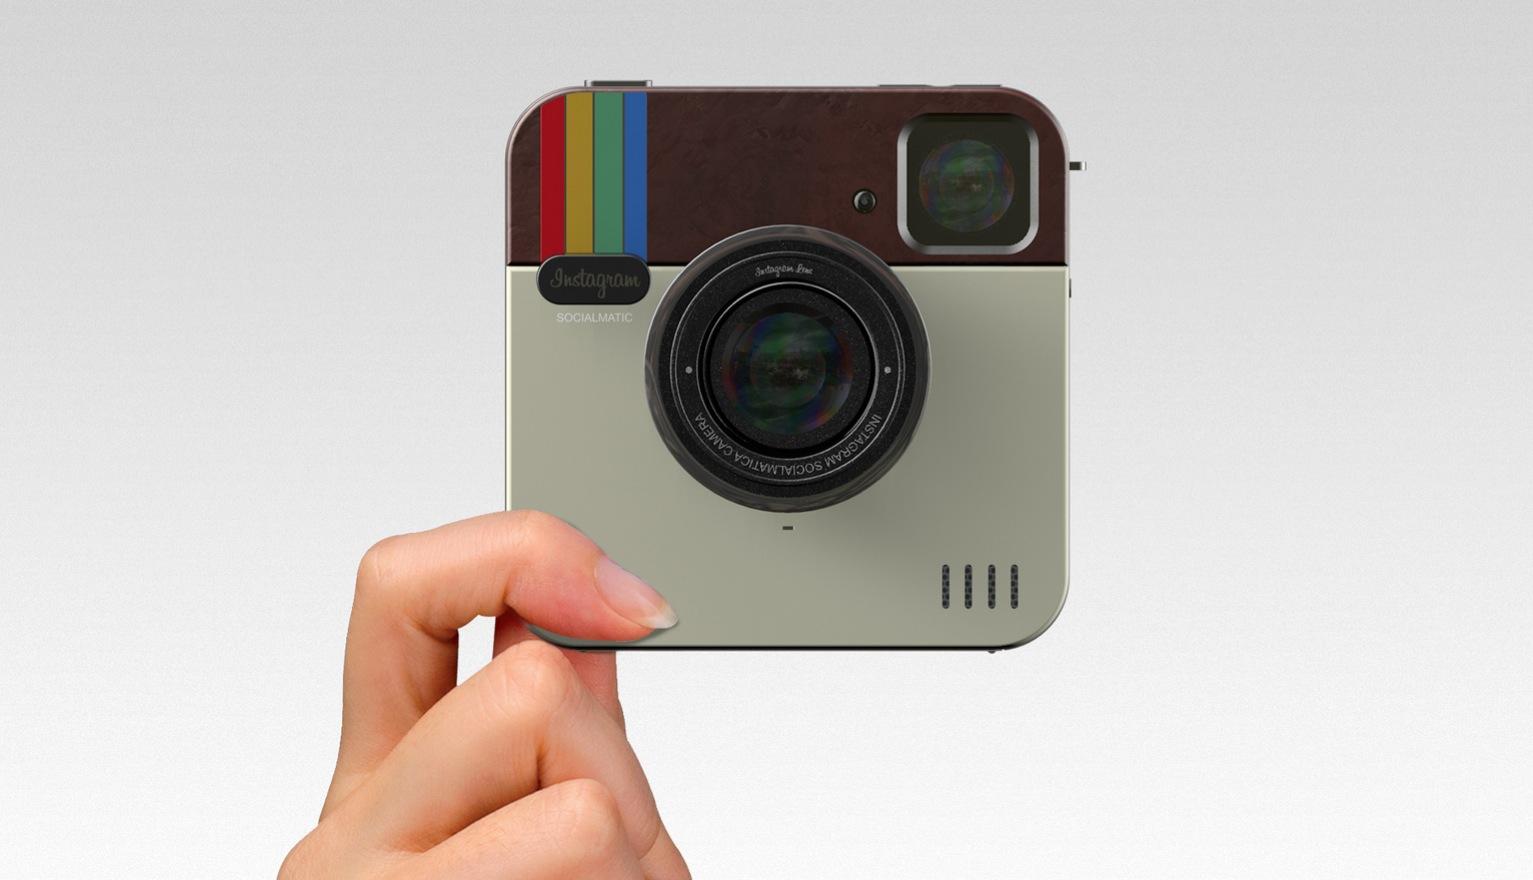 http://4.bp.blogspot.com/-Llf-uZqt4hM/T6qA5vRXD8I/AAAAAAAAFGM/eedMJaM6ogk/s1600/Instagram-Socialmatic-Camera-1.jpg